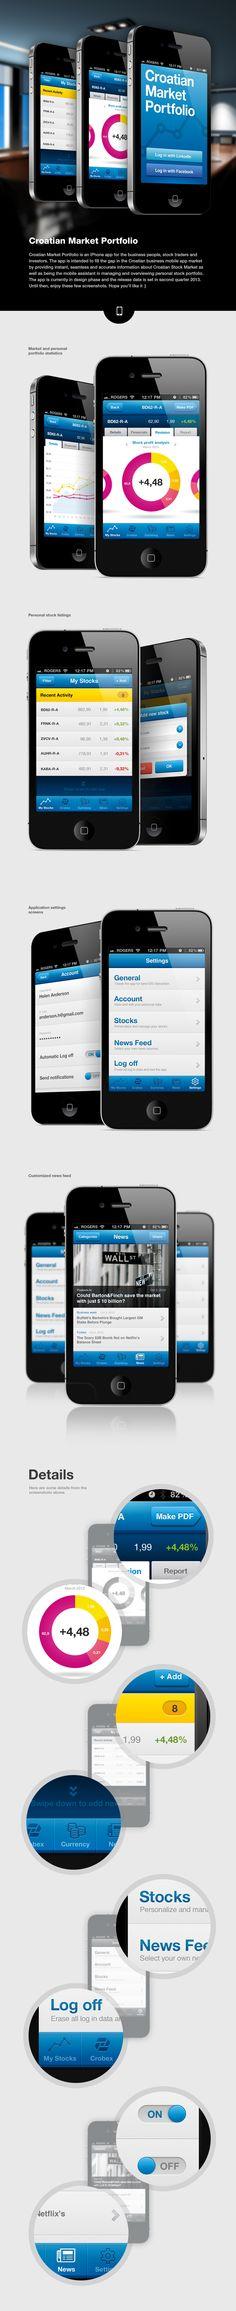 Croatian Market Portfolio (by Krešimir Kraljević) is an iPhone app for the business people, stock traders and investors.